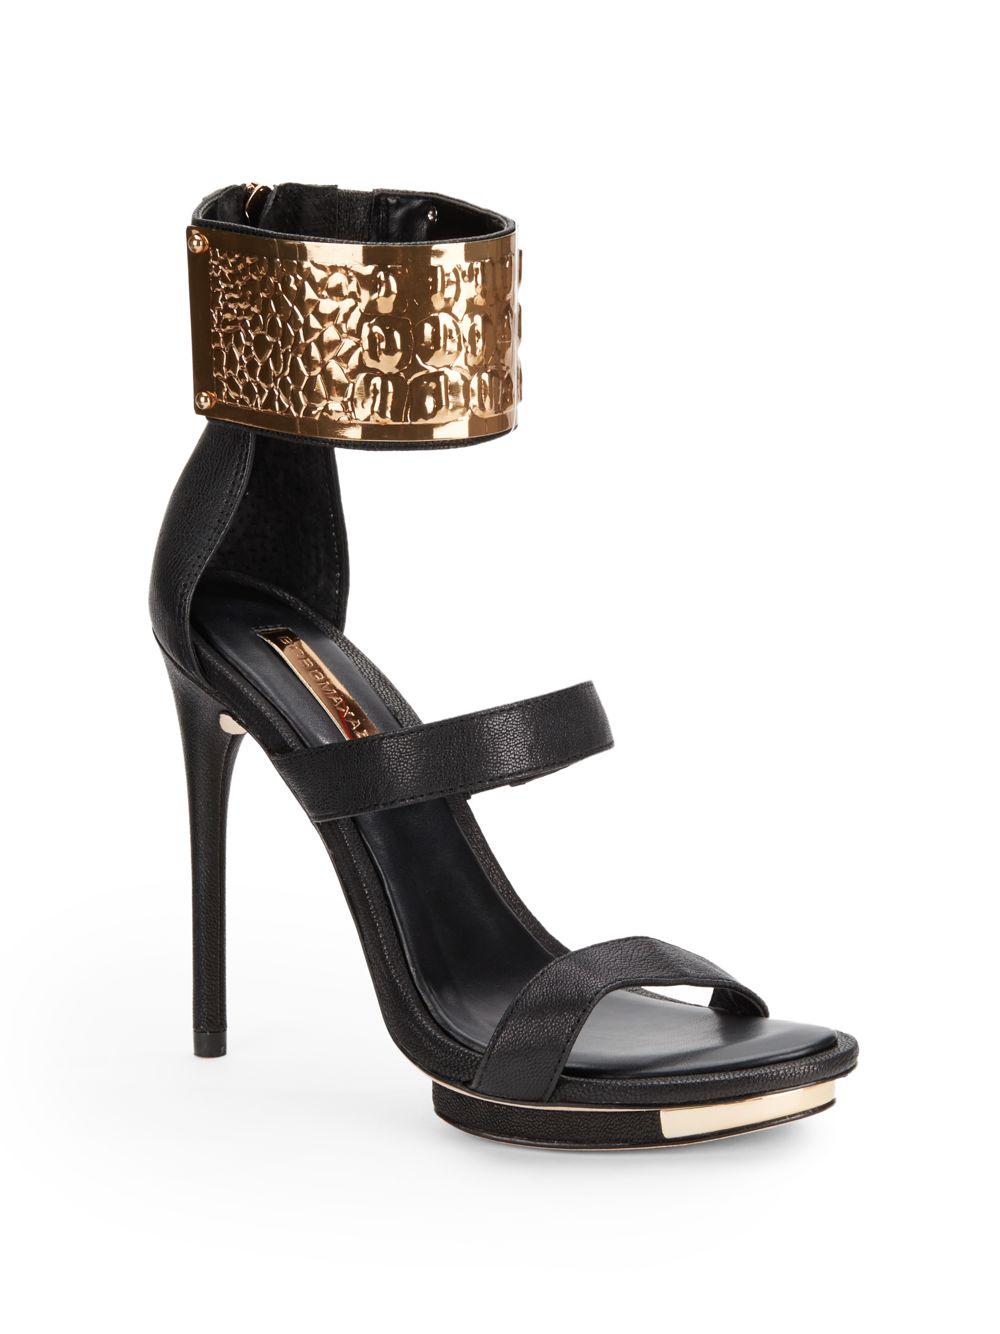 bcbgmaxazria lest metallic ankle cuff sandals in black lyst